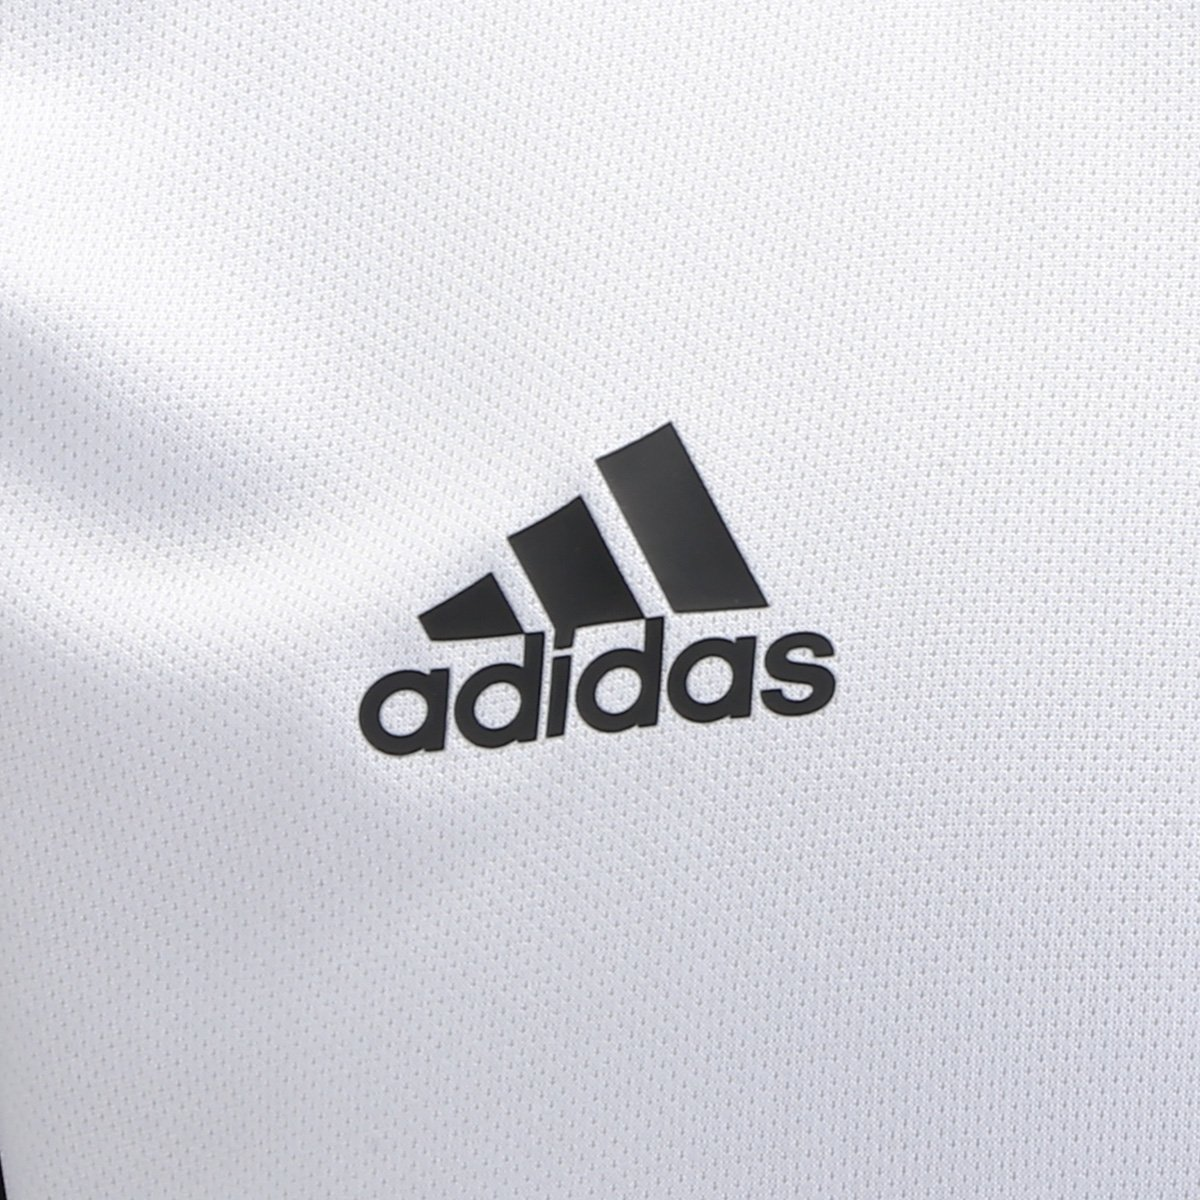 Camisa Estro 19 Adidas Masculina - 2